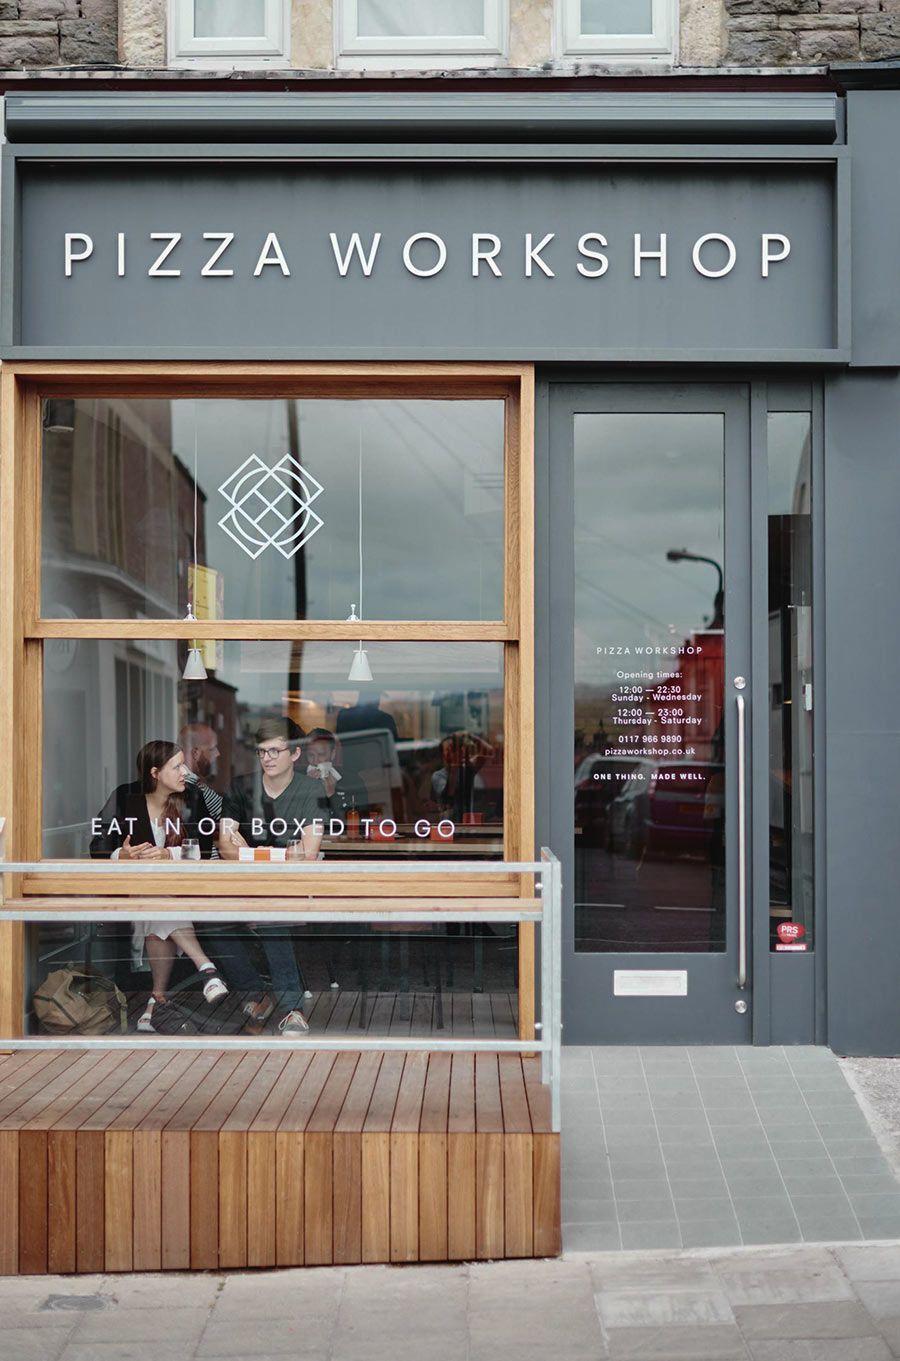 Pizza Workshop Exteriors Fachadas Cafeteria And Dise De Tienda